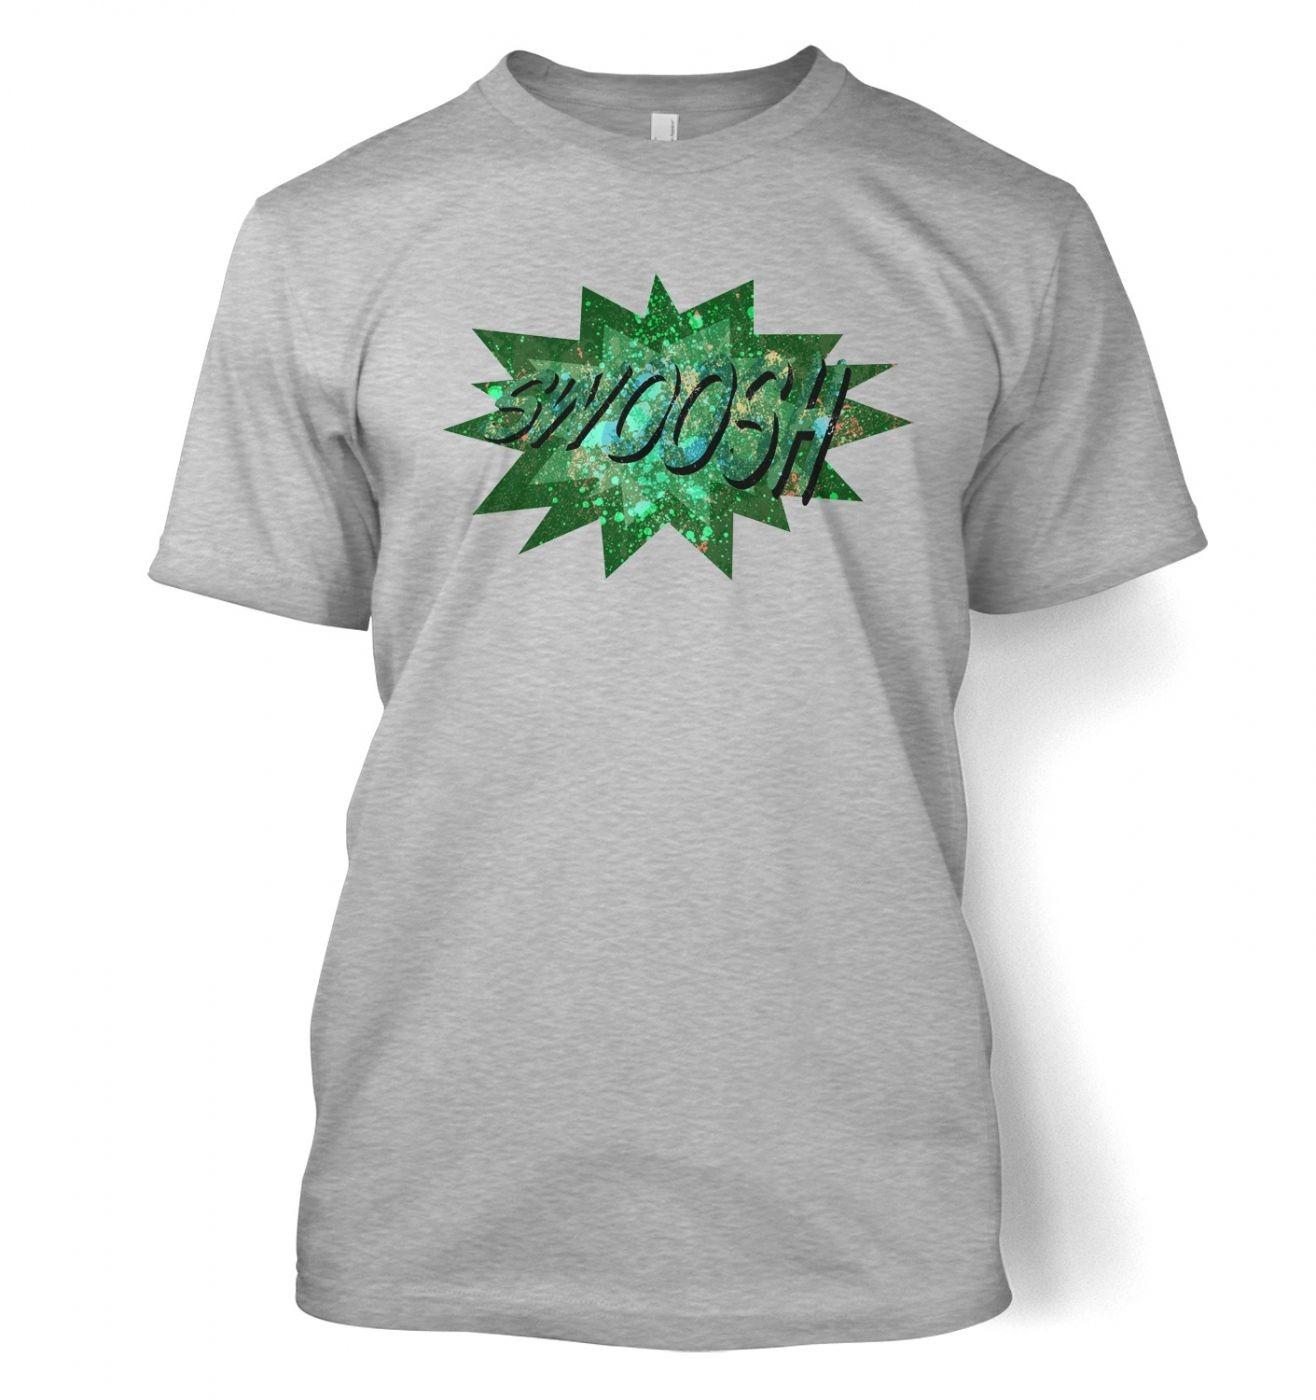 Swoosh Men's T-shirt